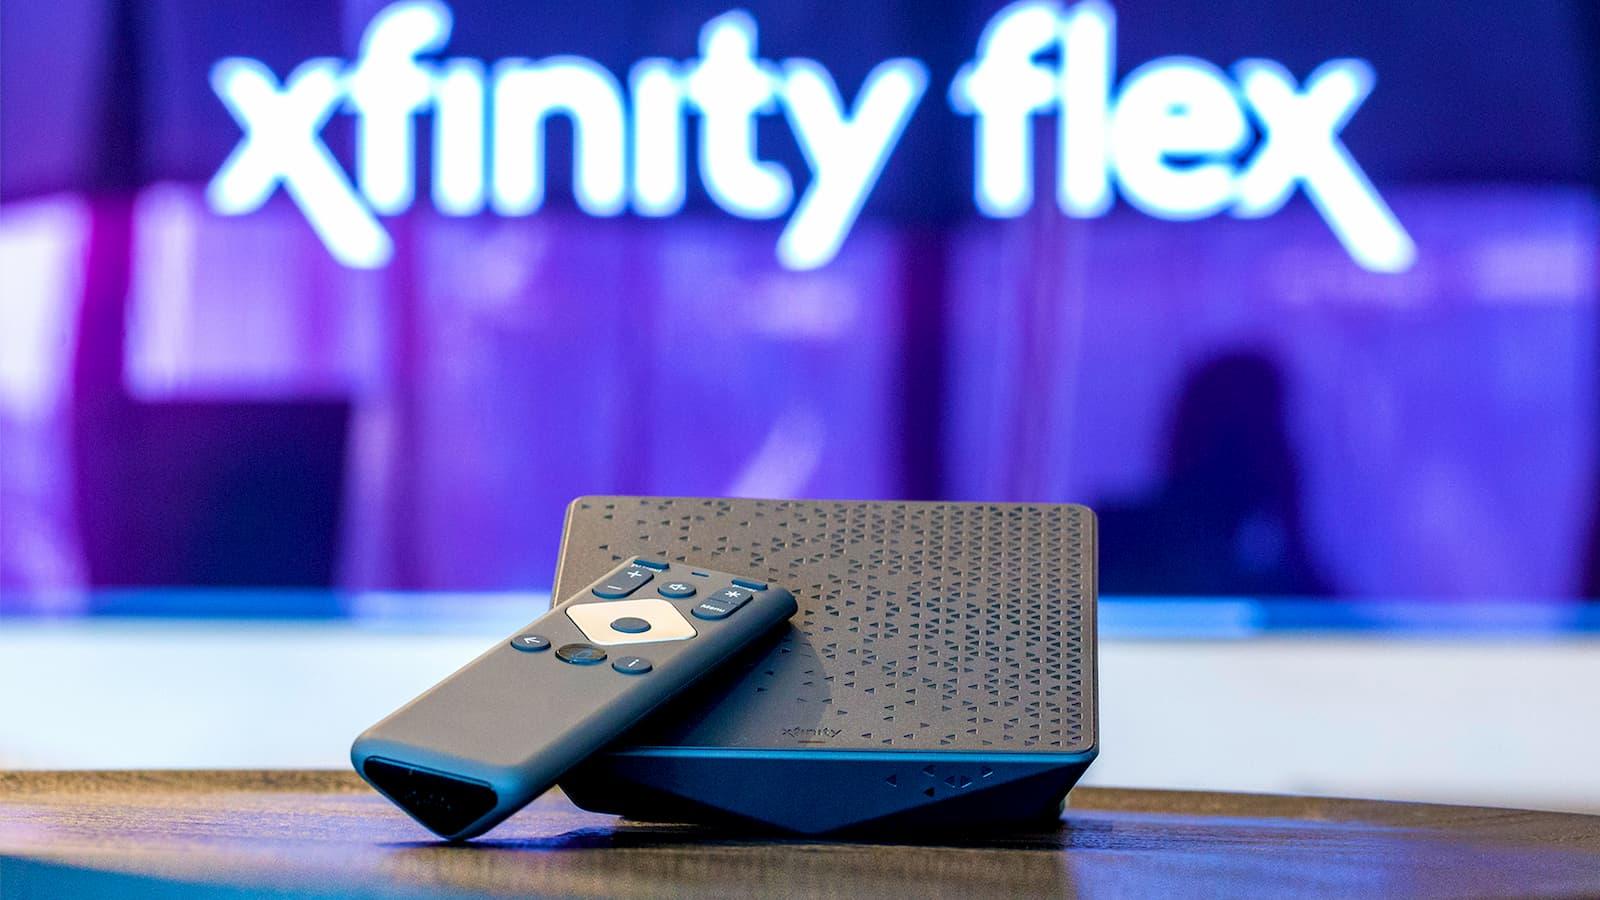 Xfinity Flex